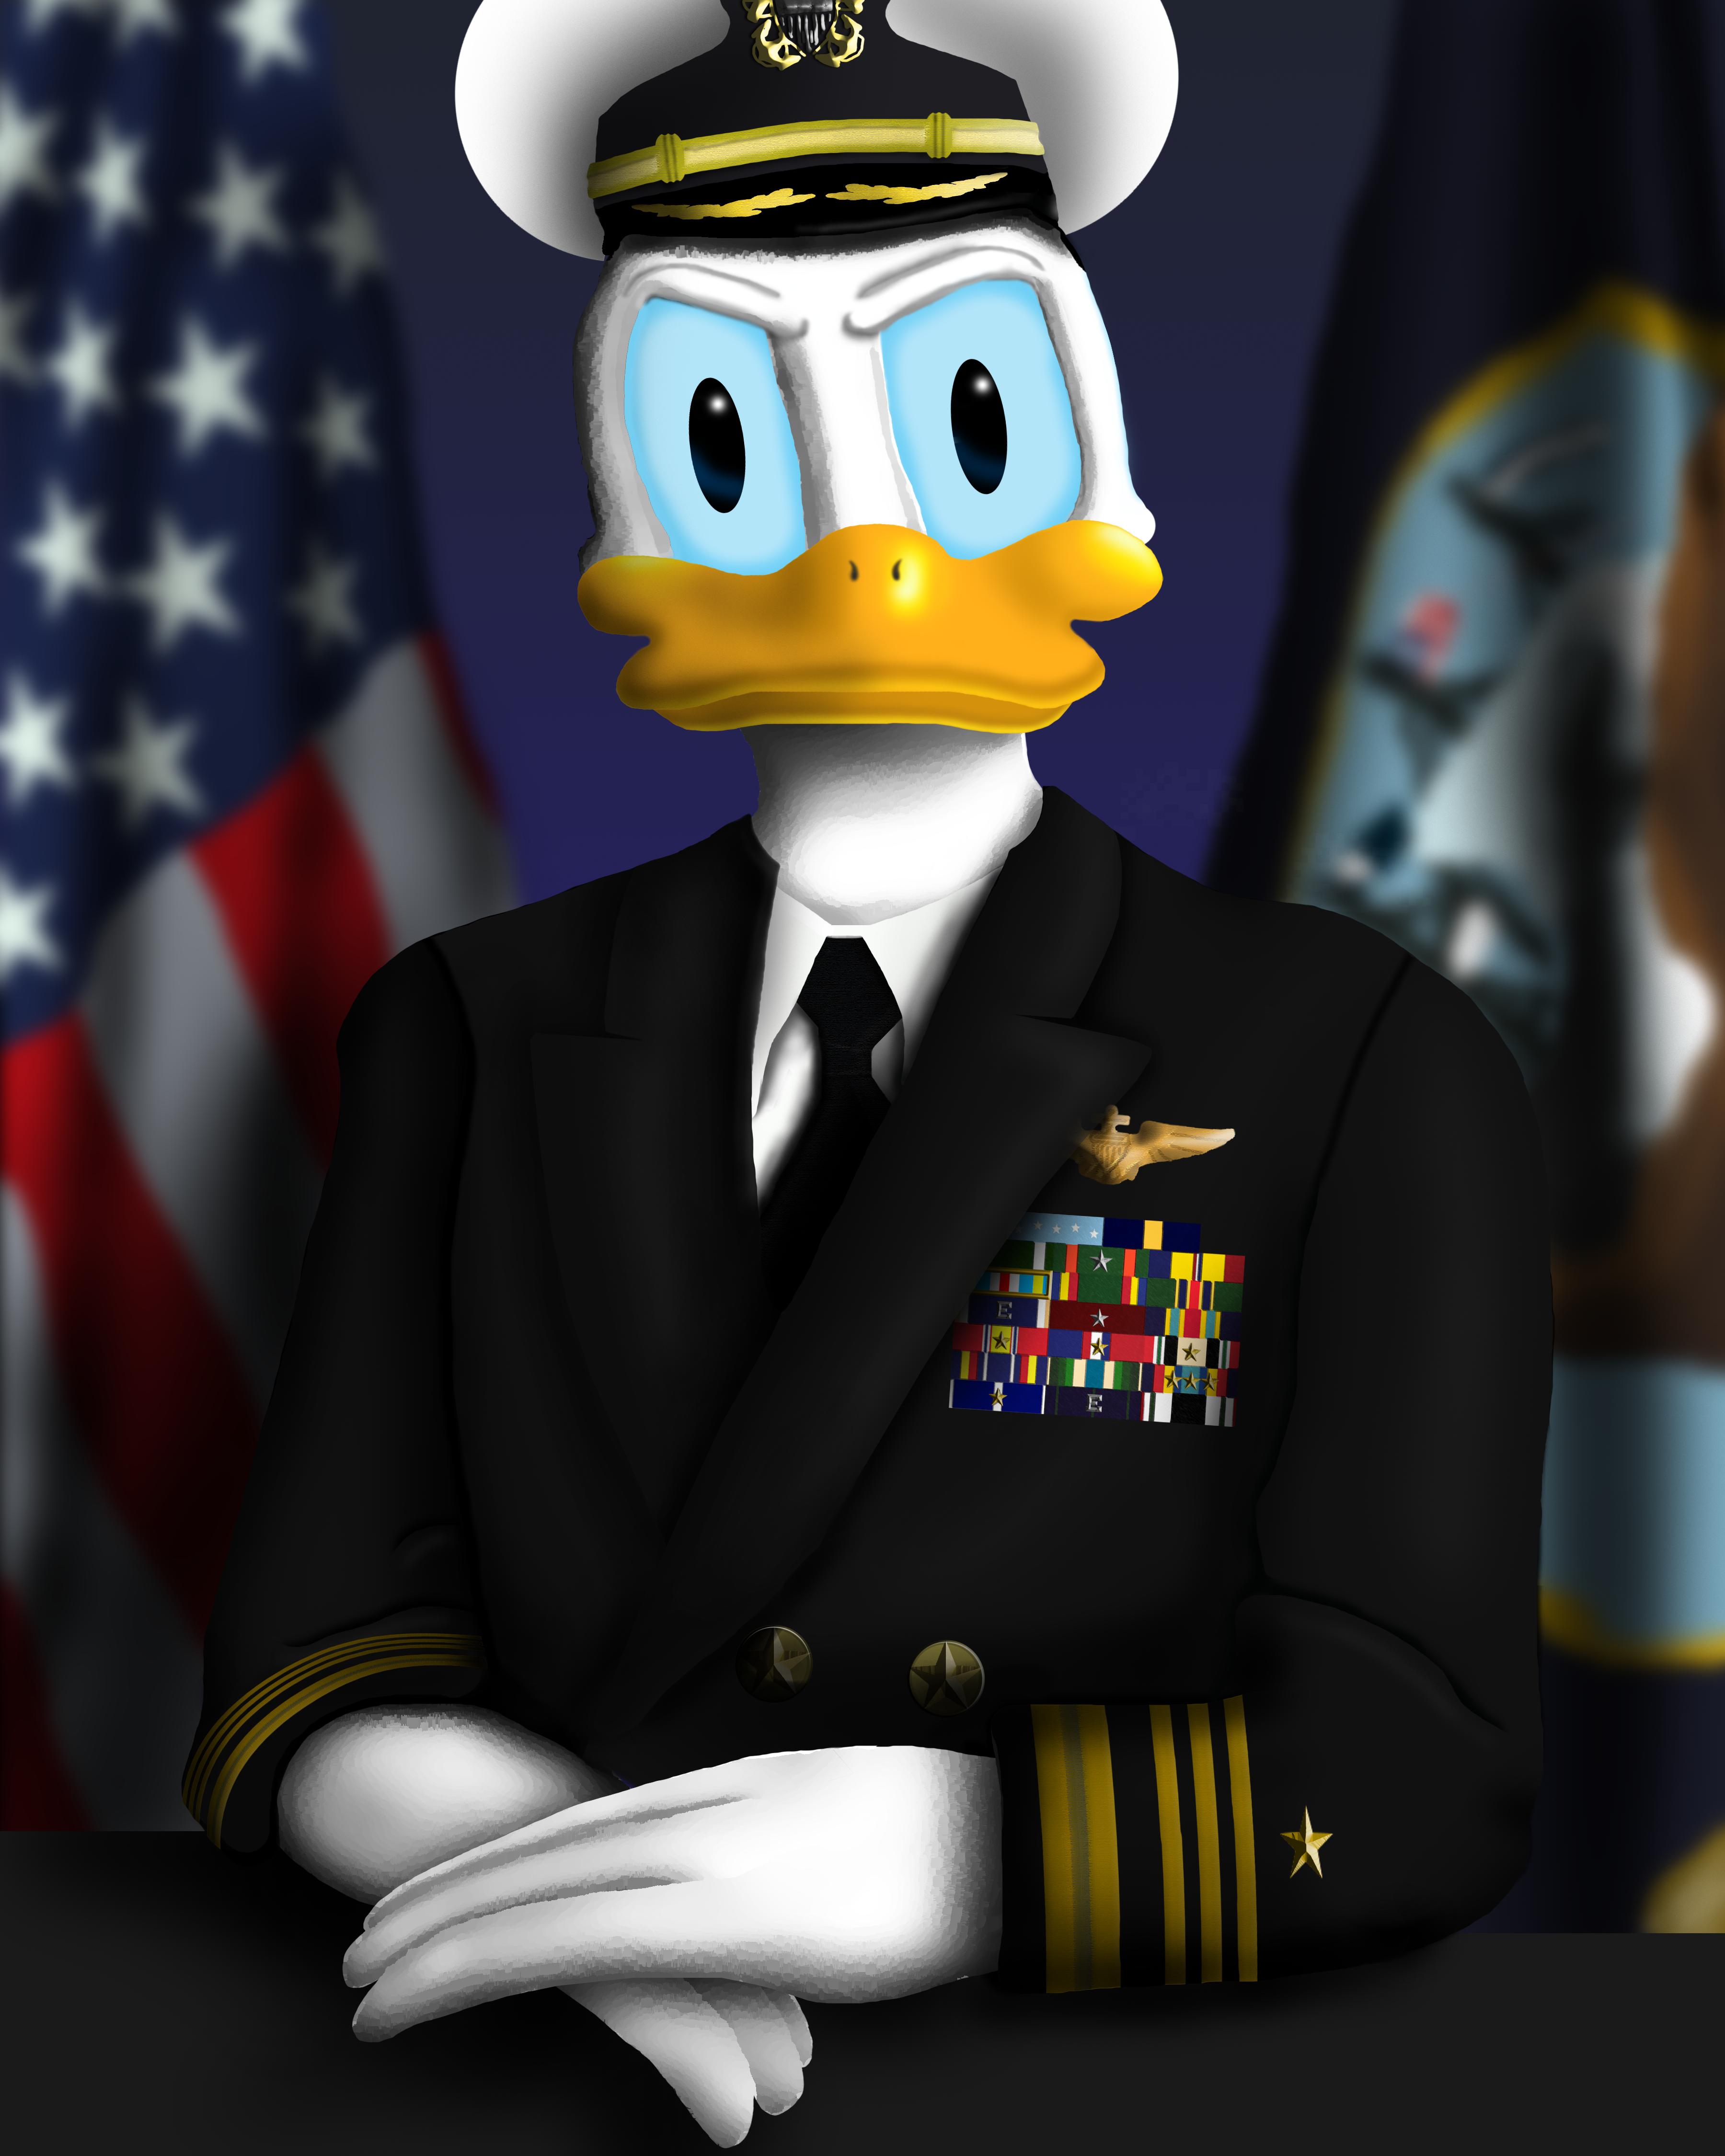 Admiral Donald Duck